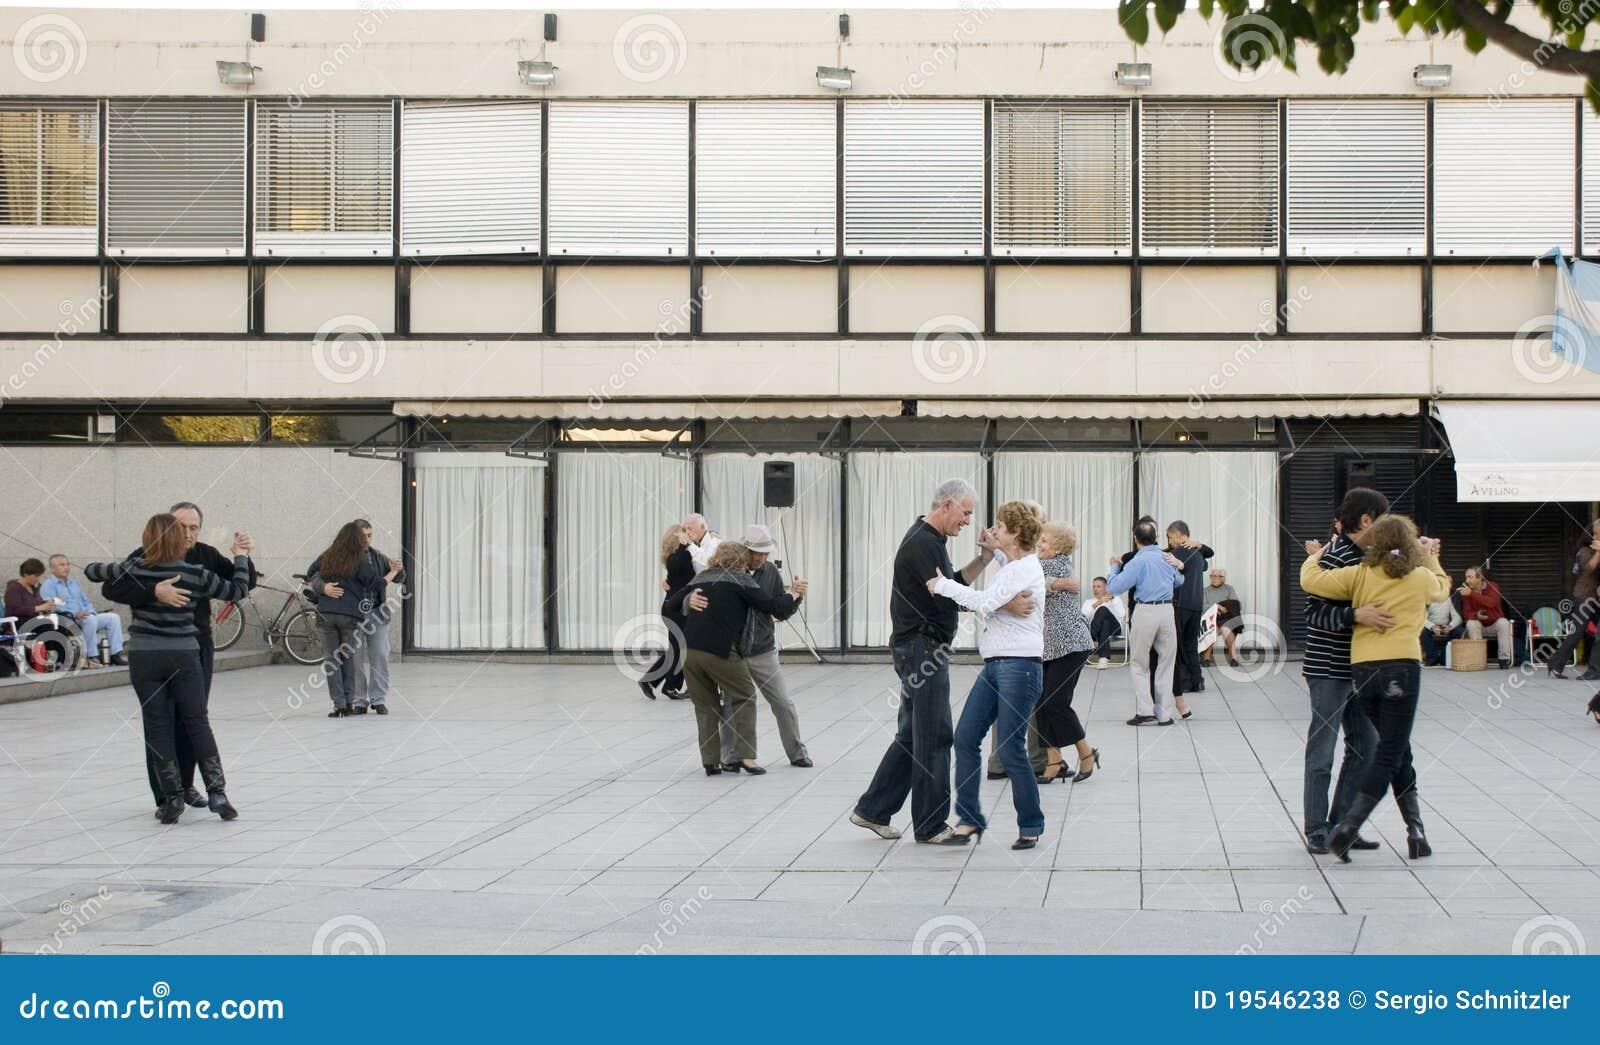 Dancing a Tango on the Street